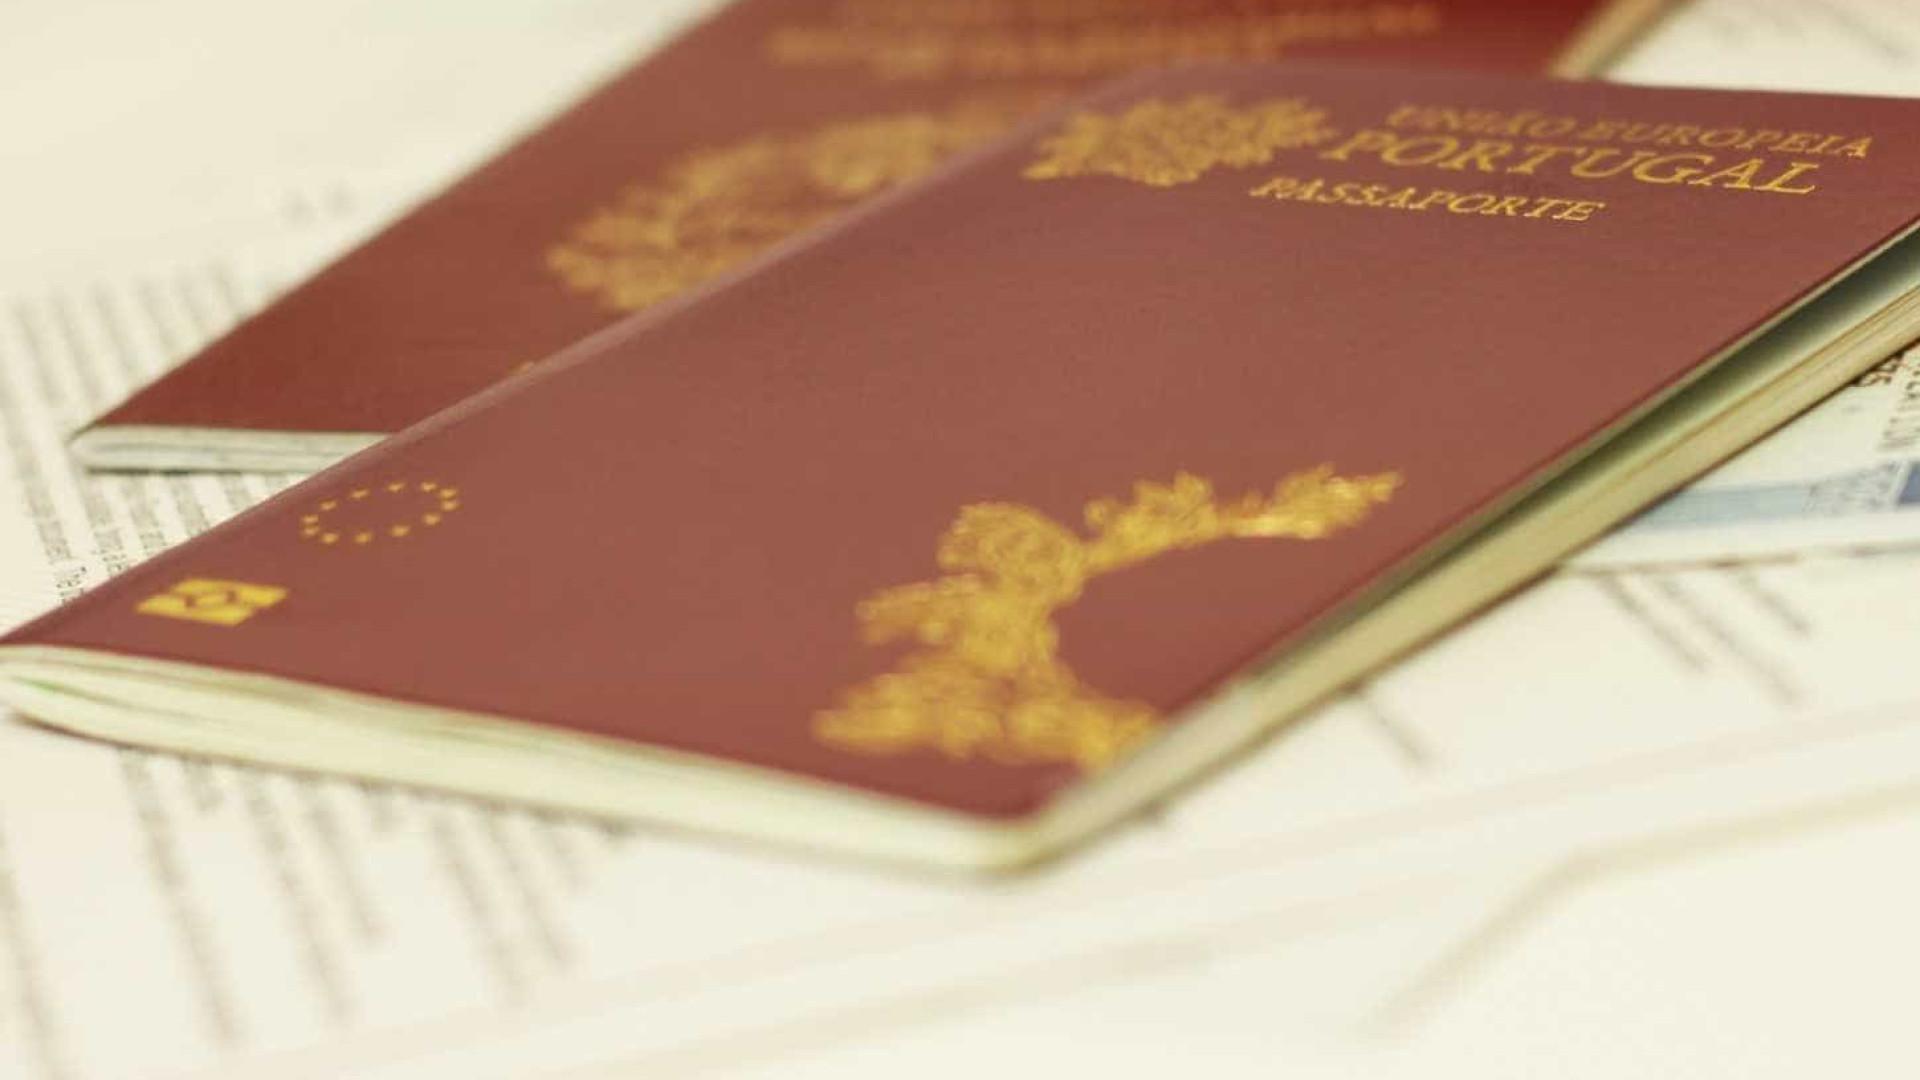 Consulado de Portugal suspende pedidos de nacionalidade